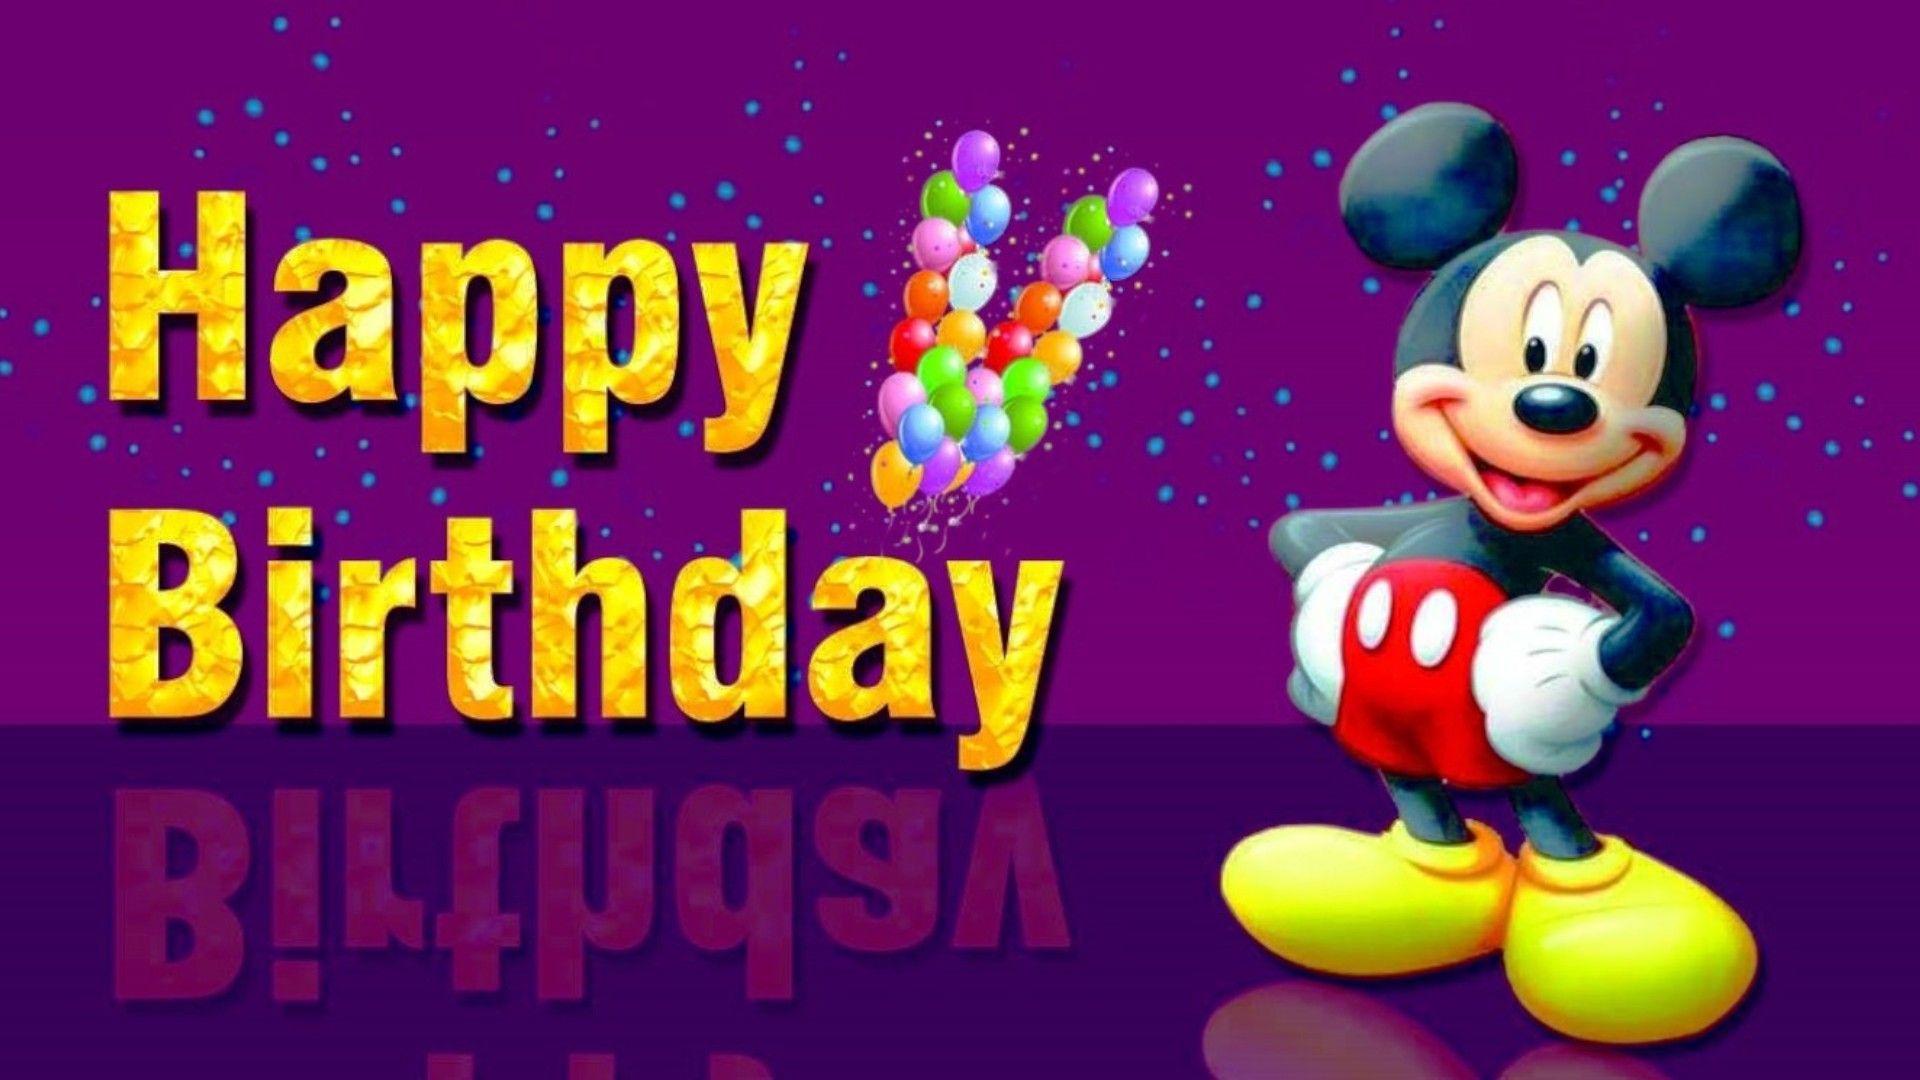 happy birthday wallpapers hd free download | wallpaper | pinterest